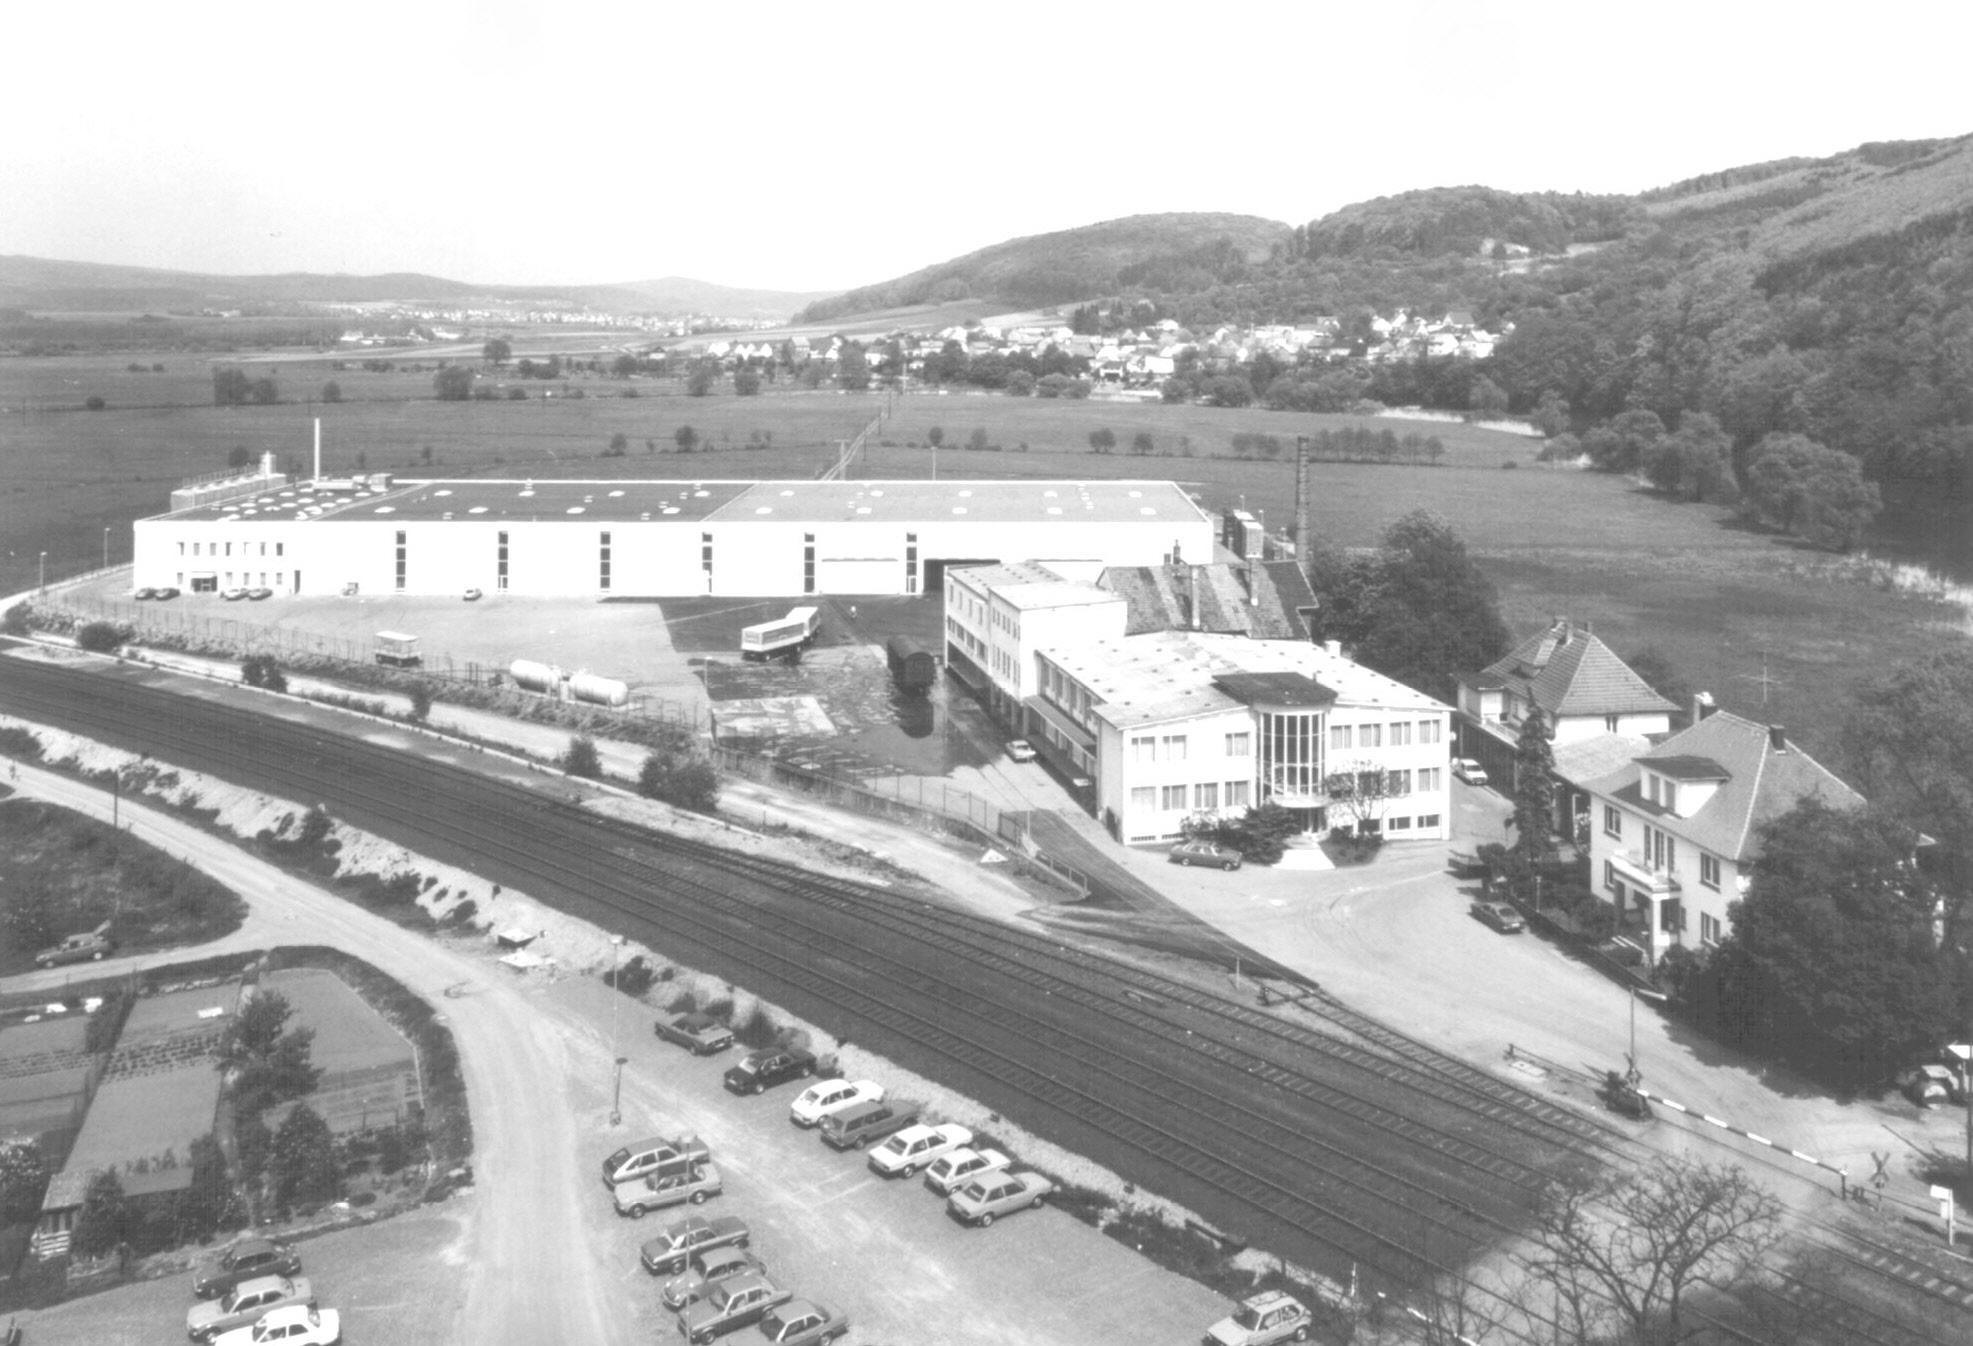 Das Firmengelände der Fa. Selters heute           Foto:  Fa. Selters Minaeralquelle